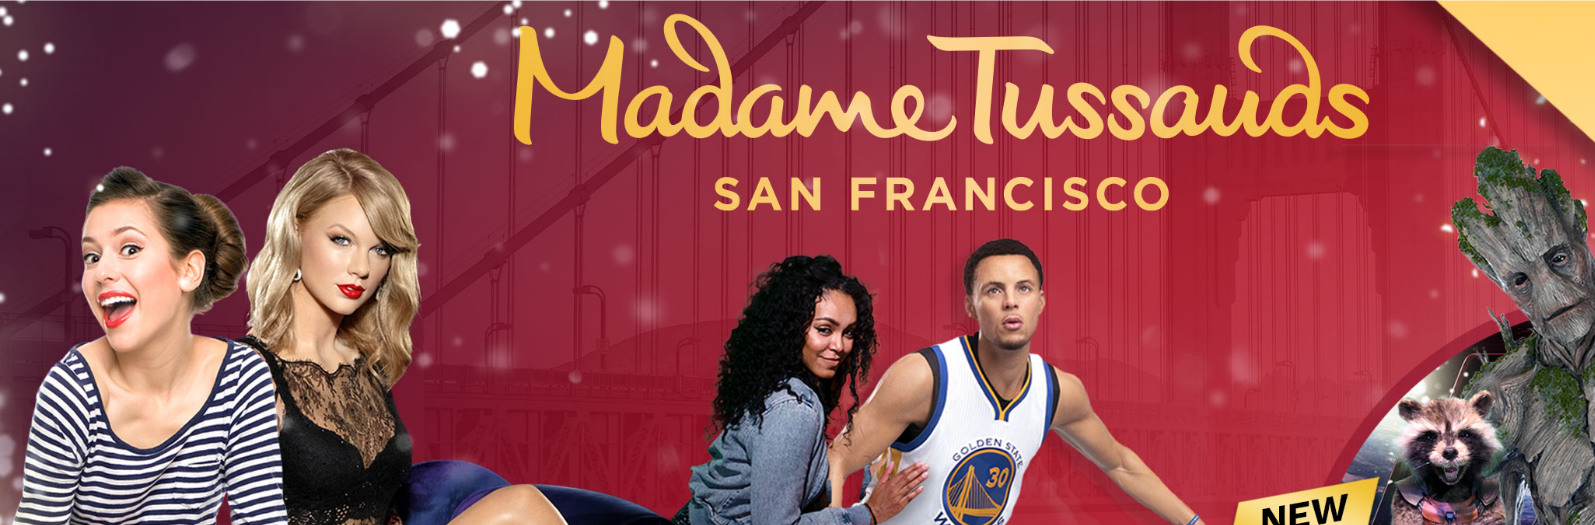 Madame Tussauds San Francisco Adarve Travel